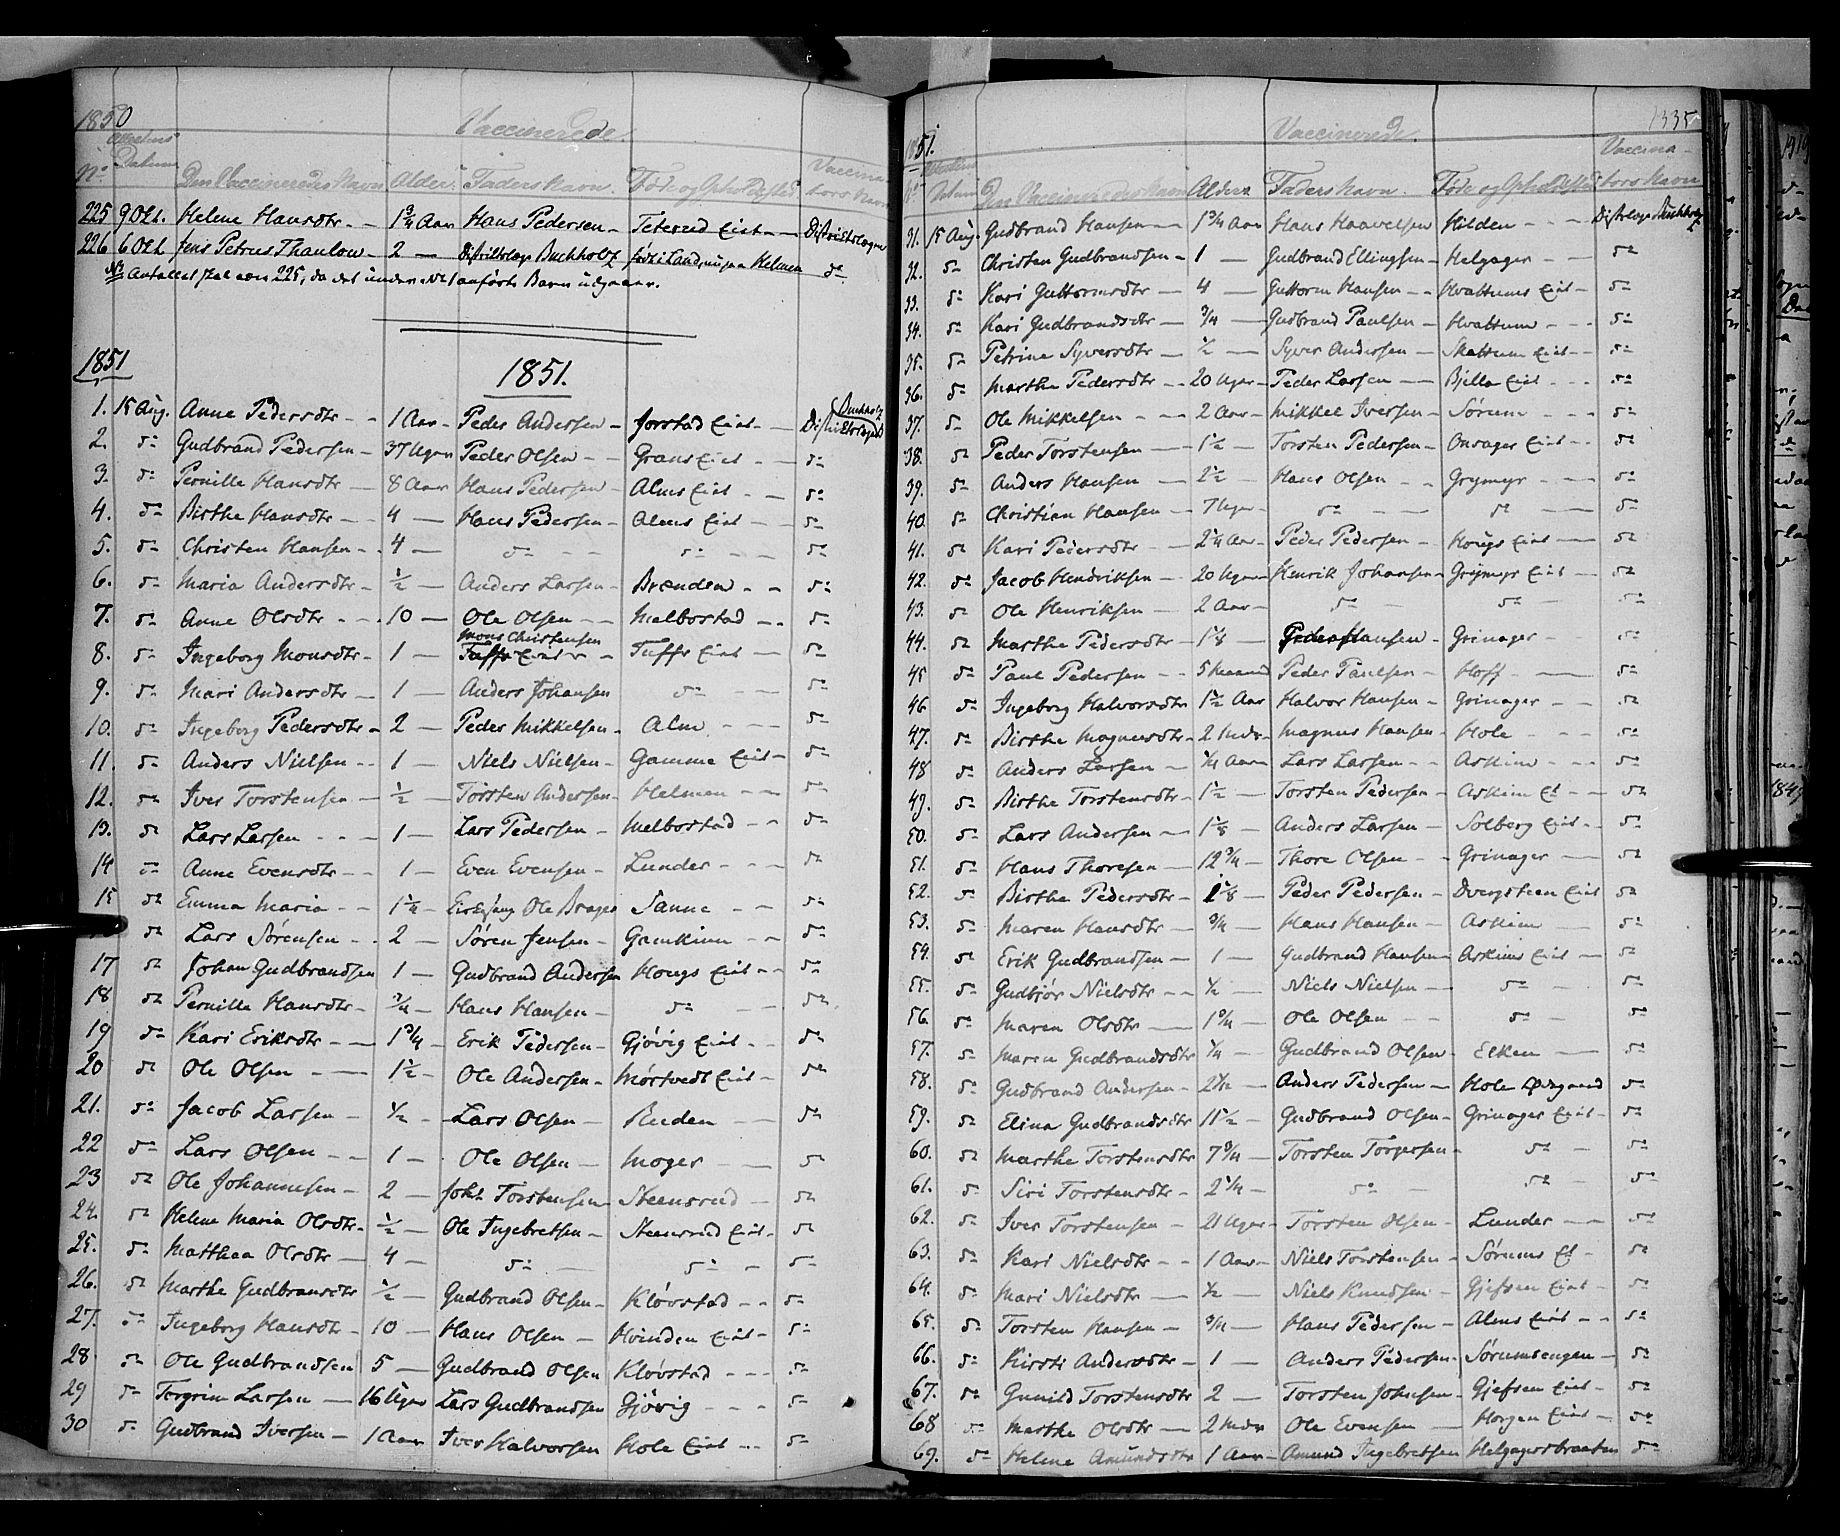 SAH, Gran prestekontor, Ministerialbok nr. 11, 1842-1856, s. 1334-1335